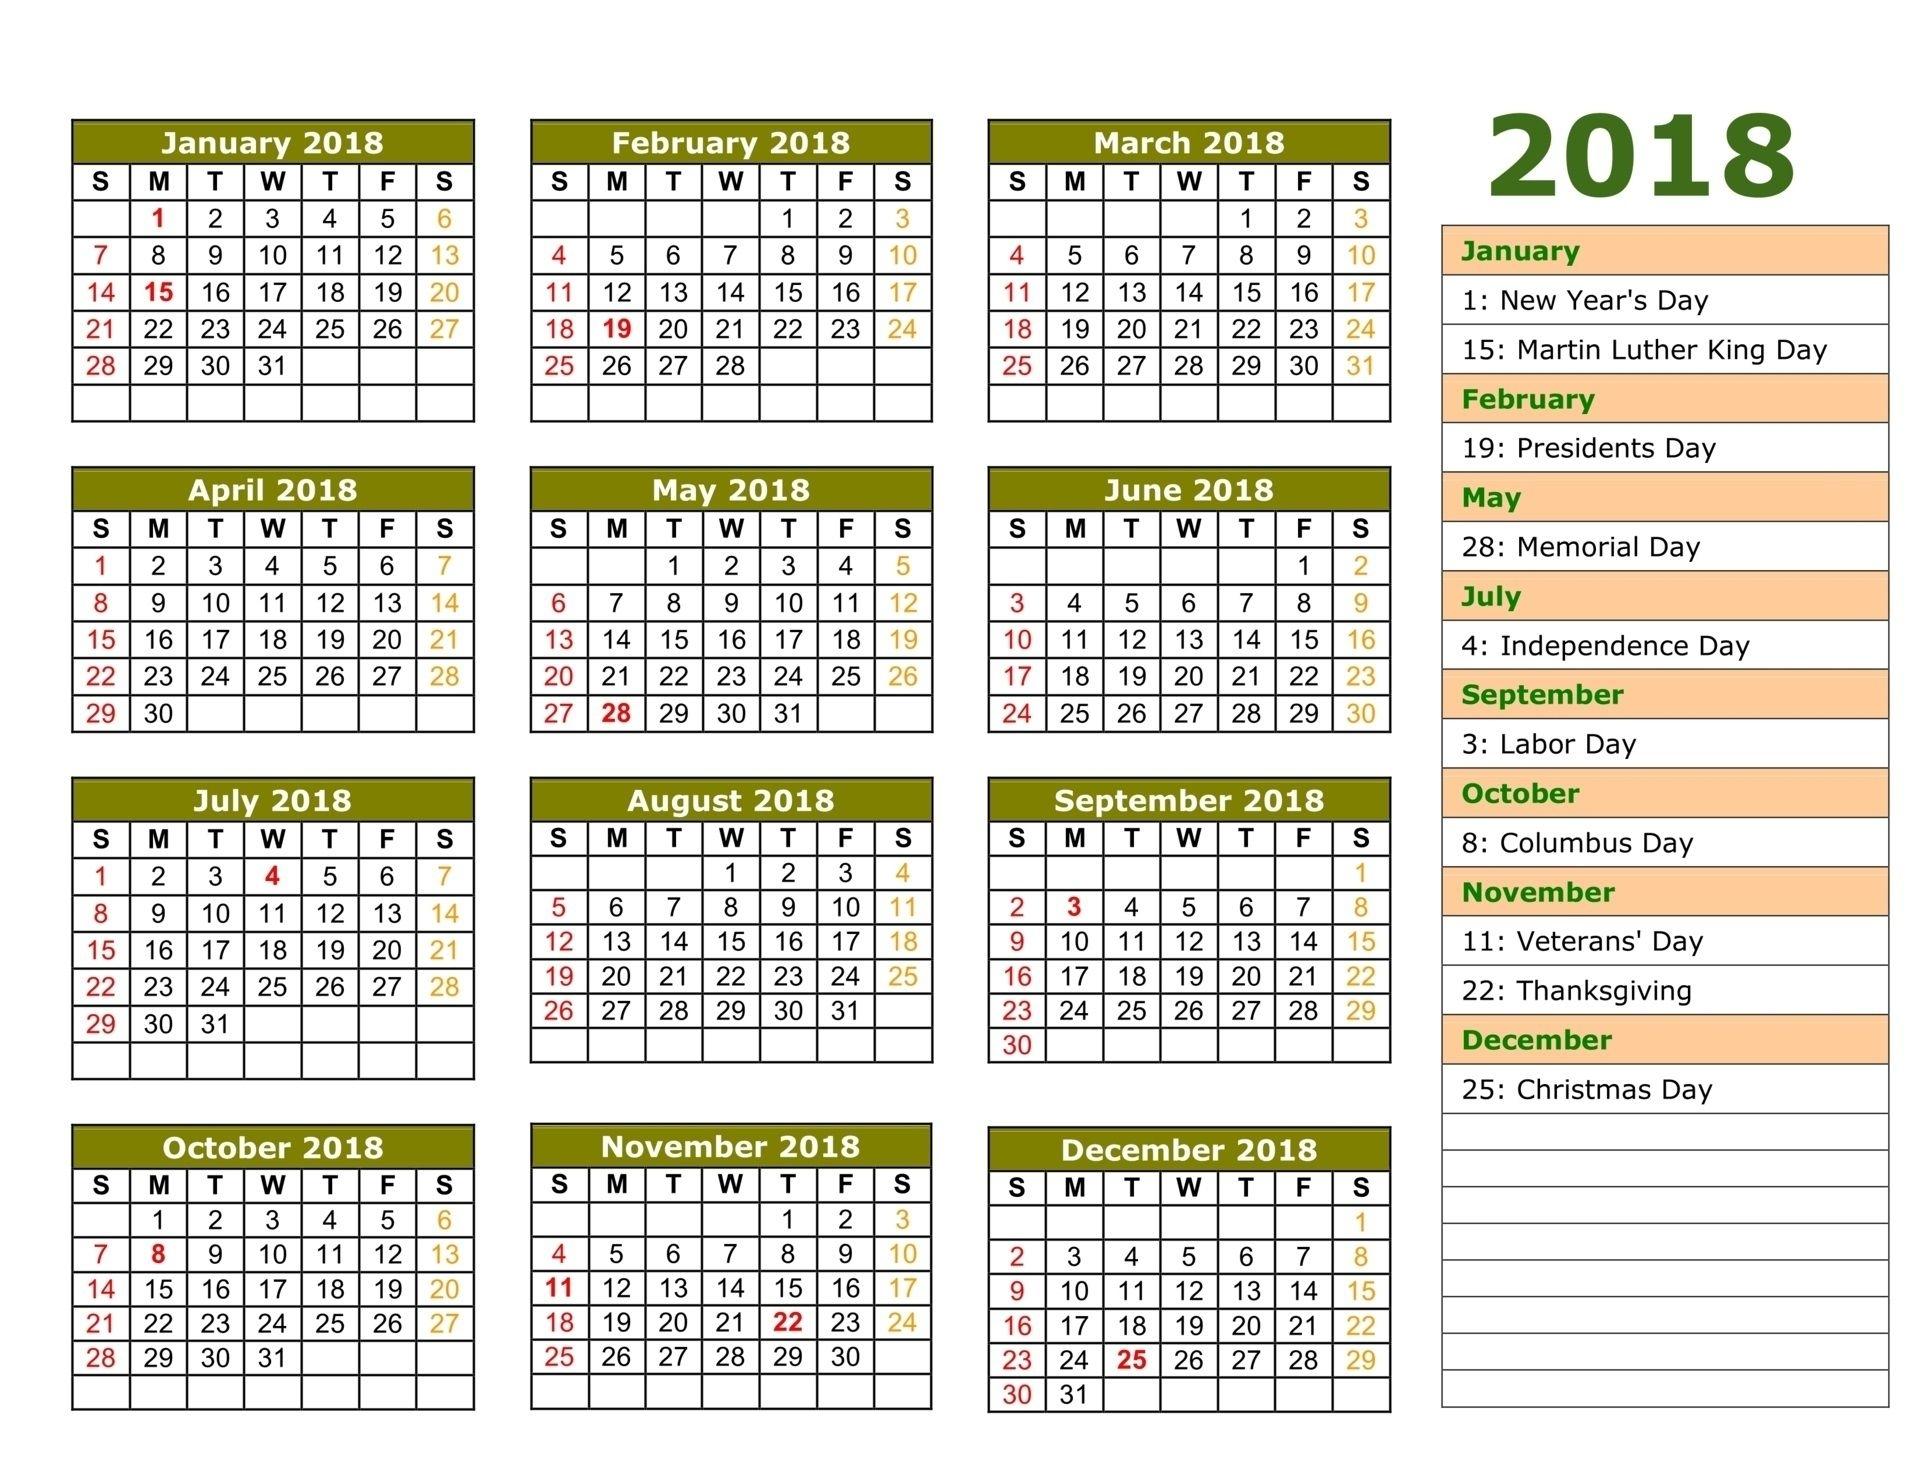 Islamic Calendar 2018, Hijri Calendar 2018 | Desktop | Hijri inside Islamic Calendar 2015 Pdf Free Download